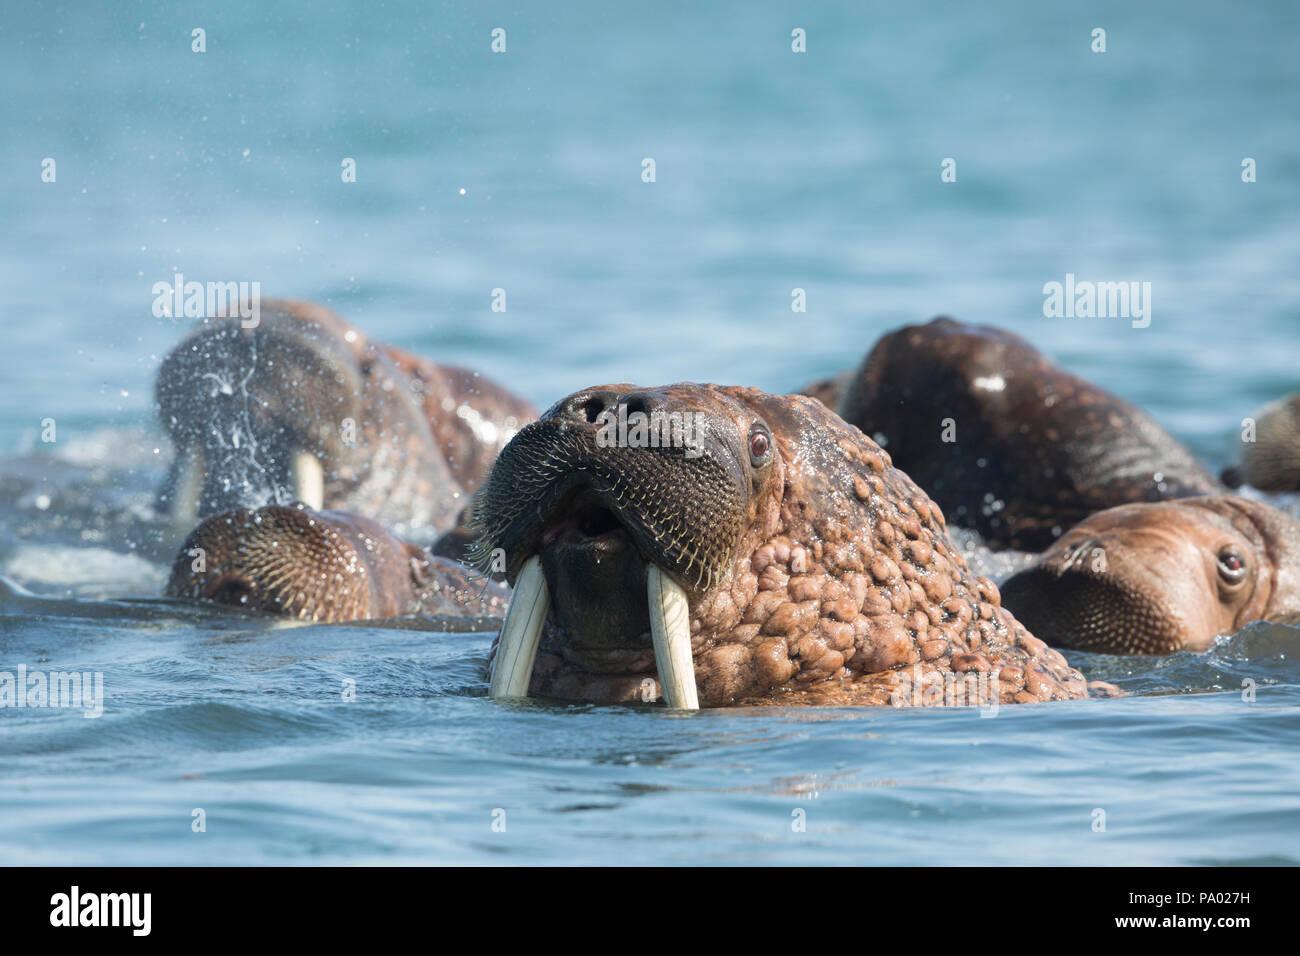 Pacific Walrus (Odobenus rosmarus divergens), Kamchatka, Russia Stock Photo